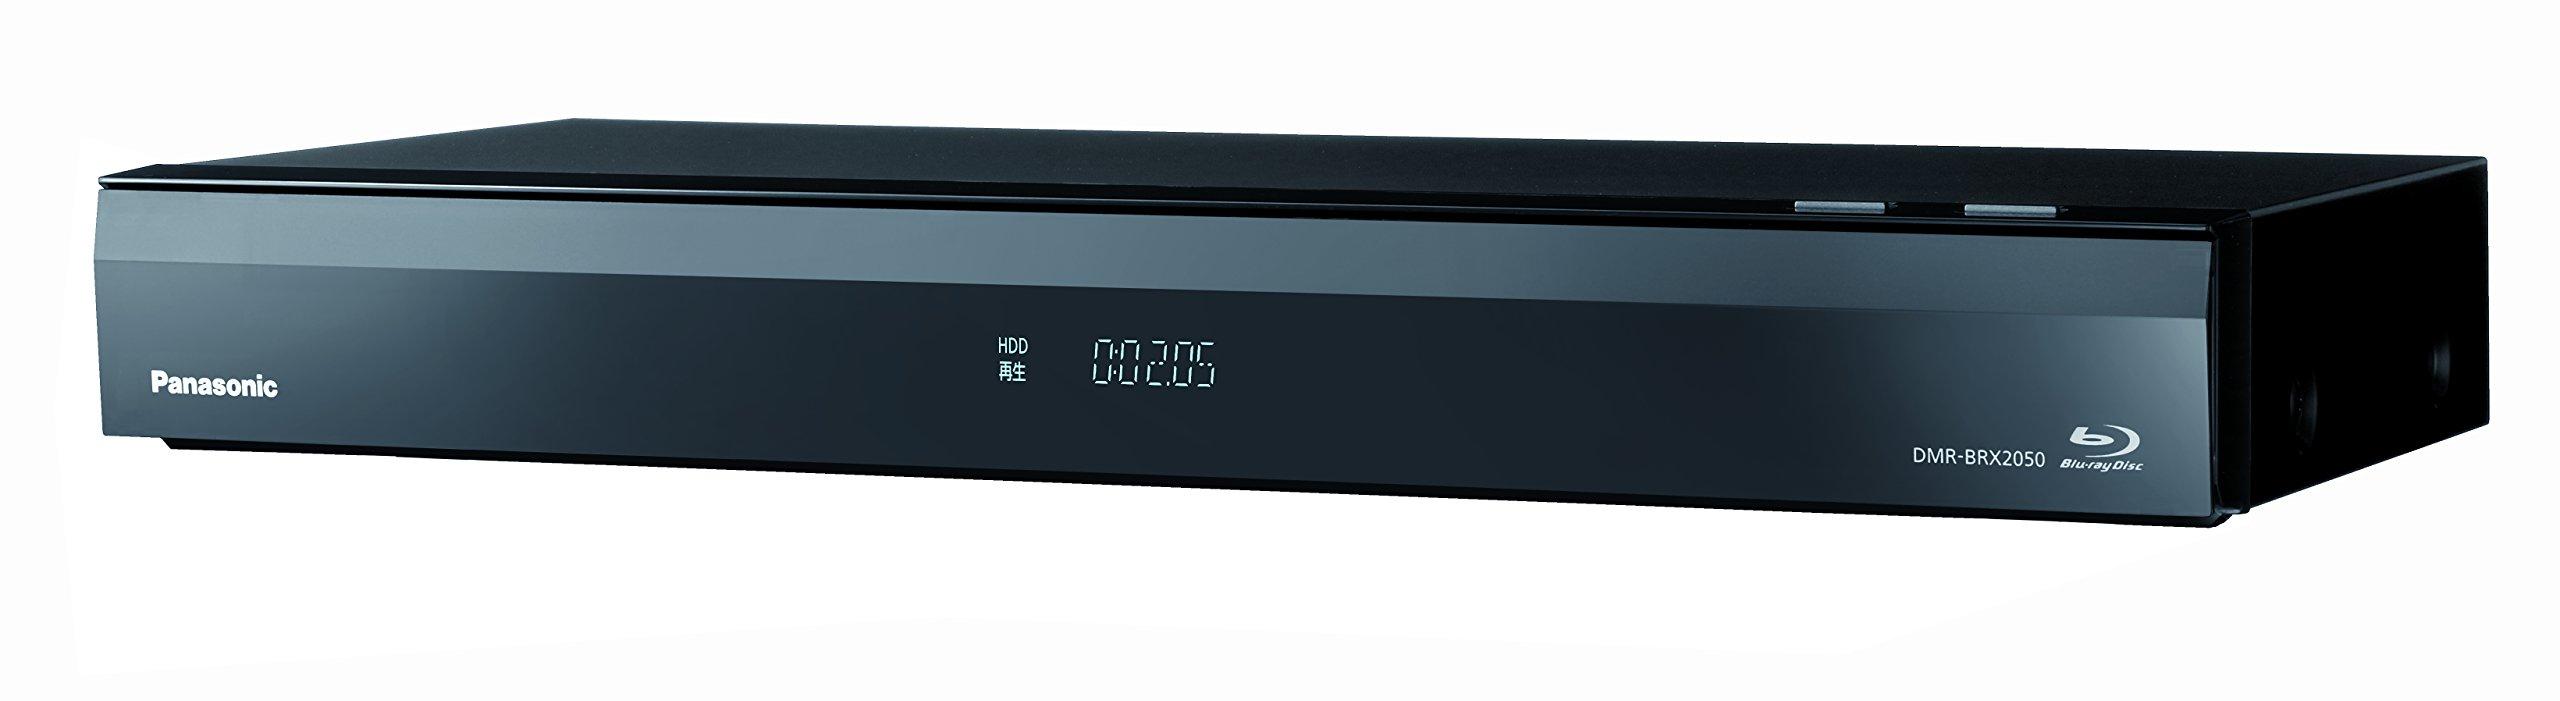 2TB 7チューナー ブルーレイレコーダー 全録 6チャンネル同時録画 4Kアップコンバート対応 全自動 おうちクラウドDIGA DMR-BRX2050